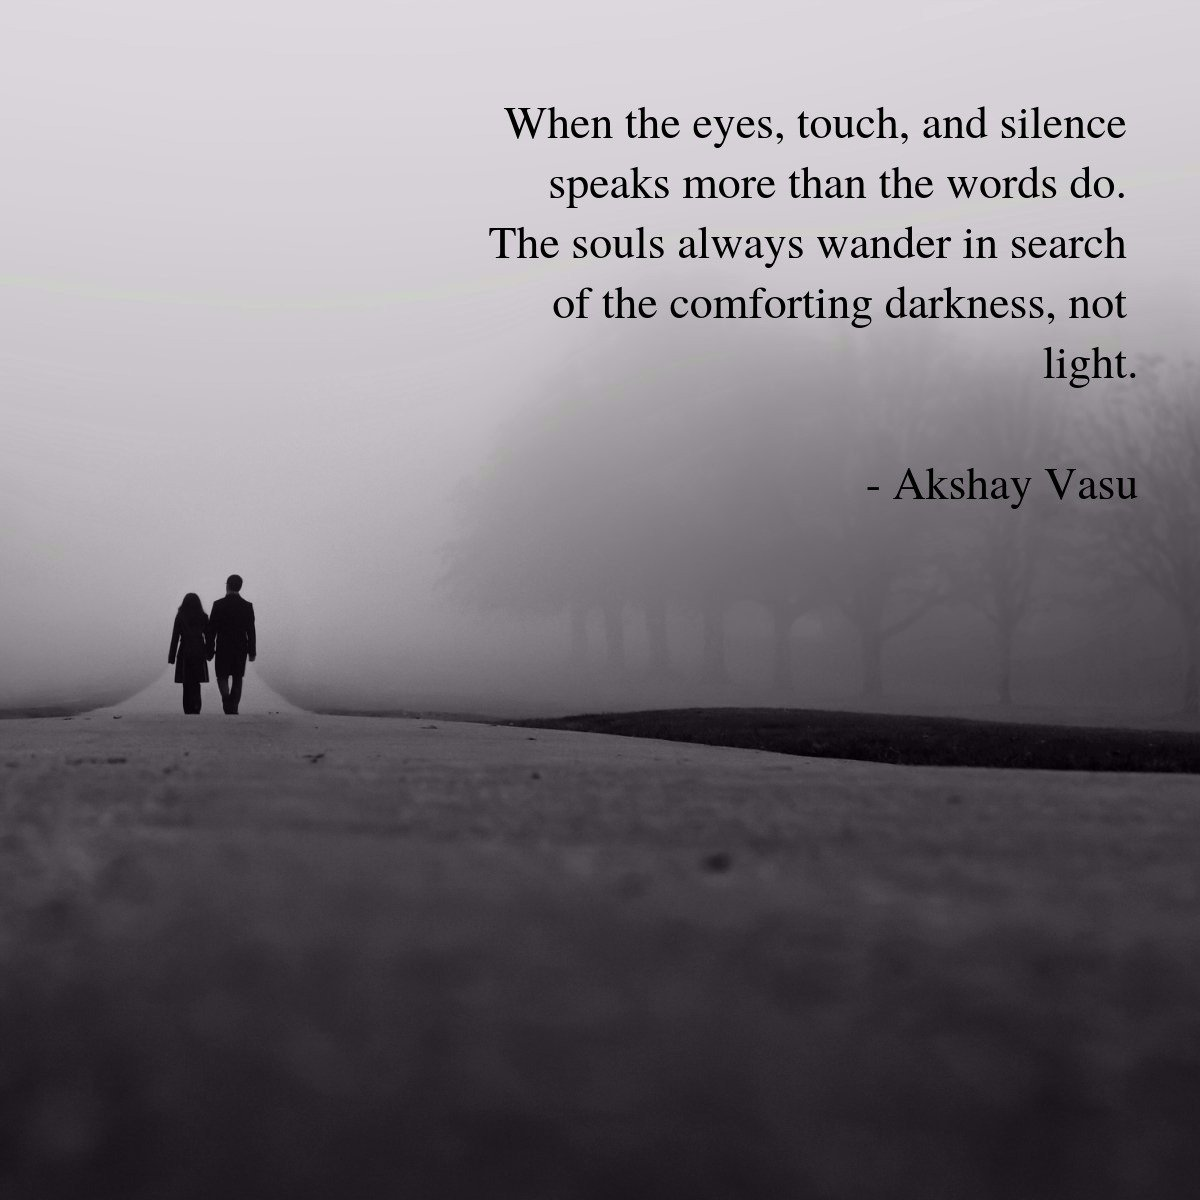 Akshay Vasu On Twitter Comforting Darkness Soul Words Touch